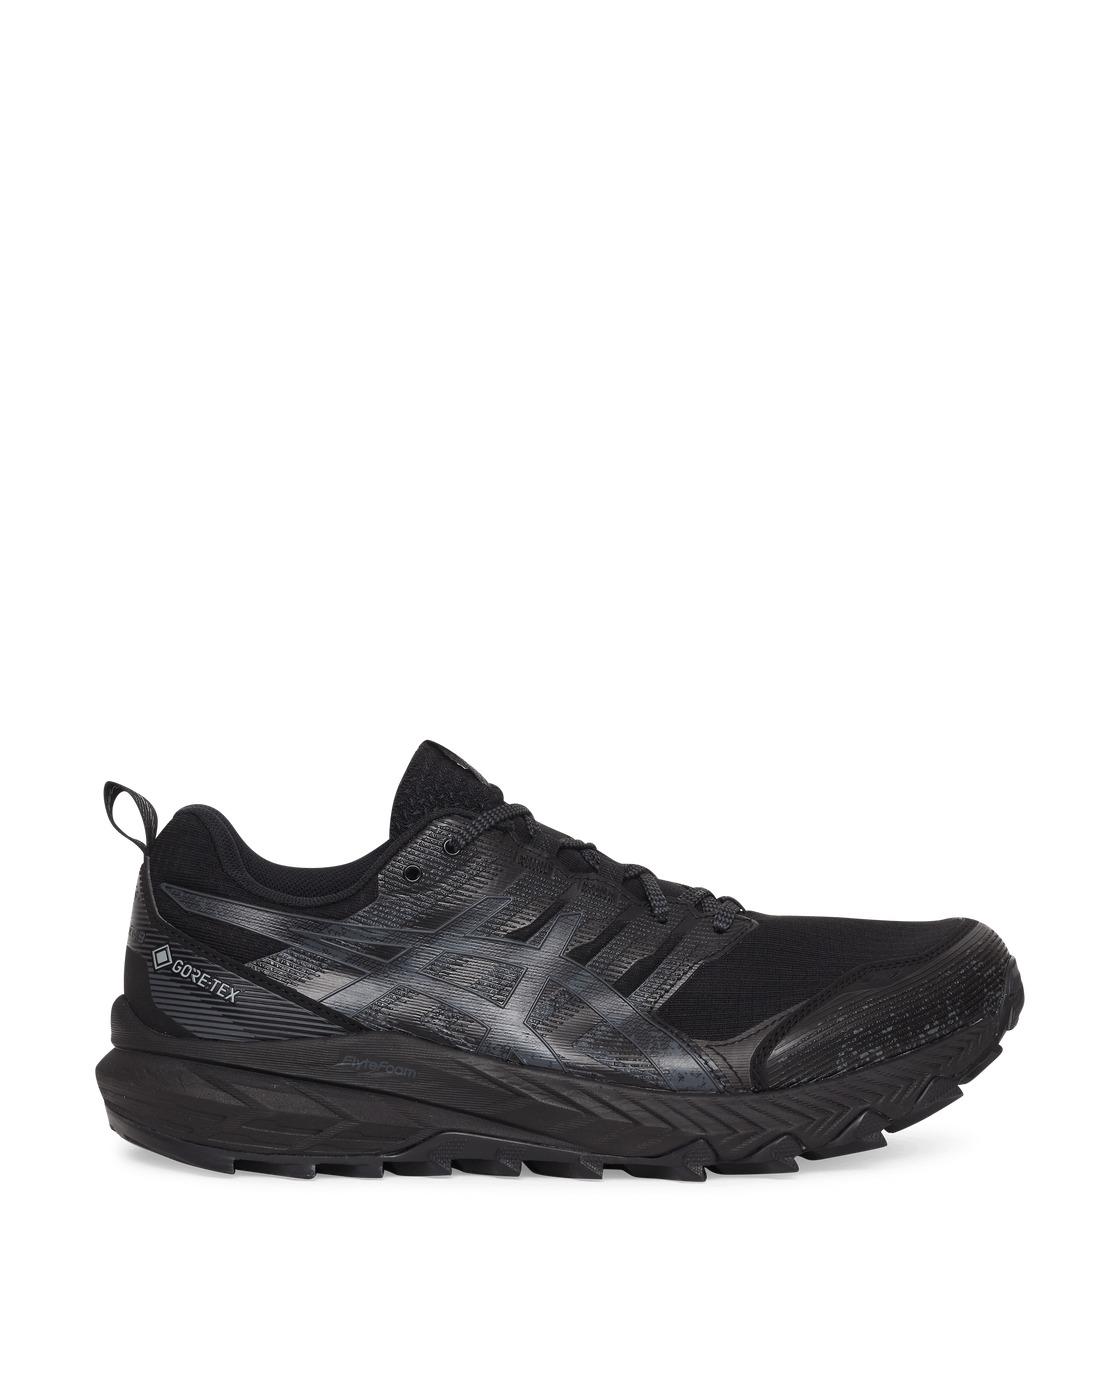 Asics Gel Trabuco 9 Gtx Sneakers Black/Black